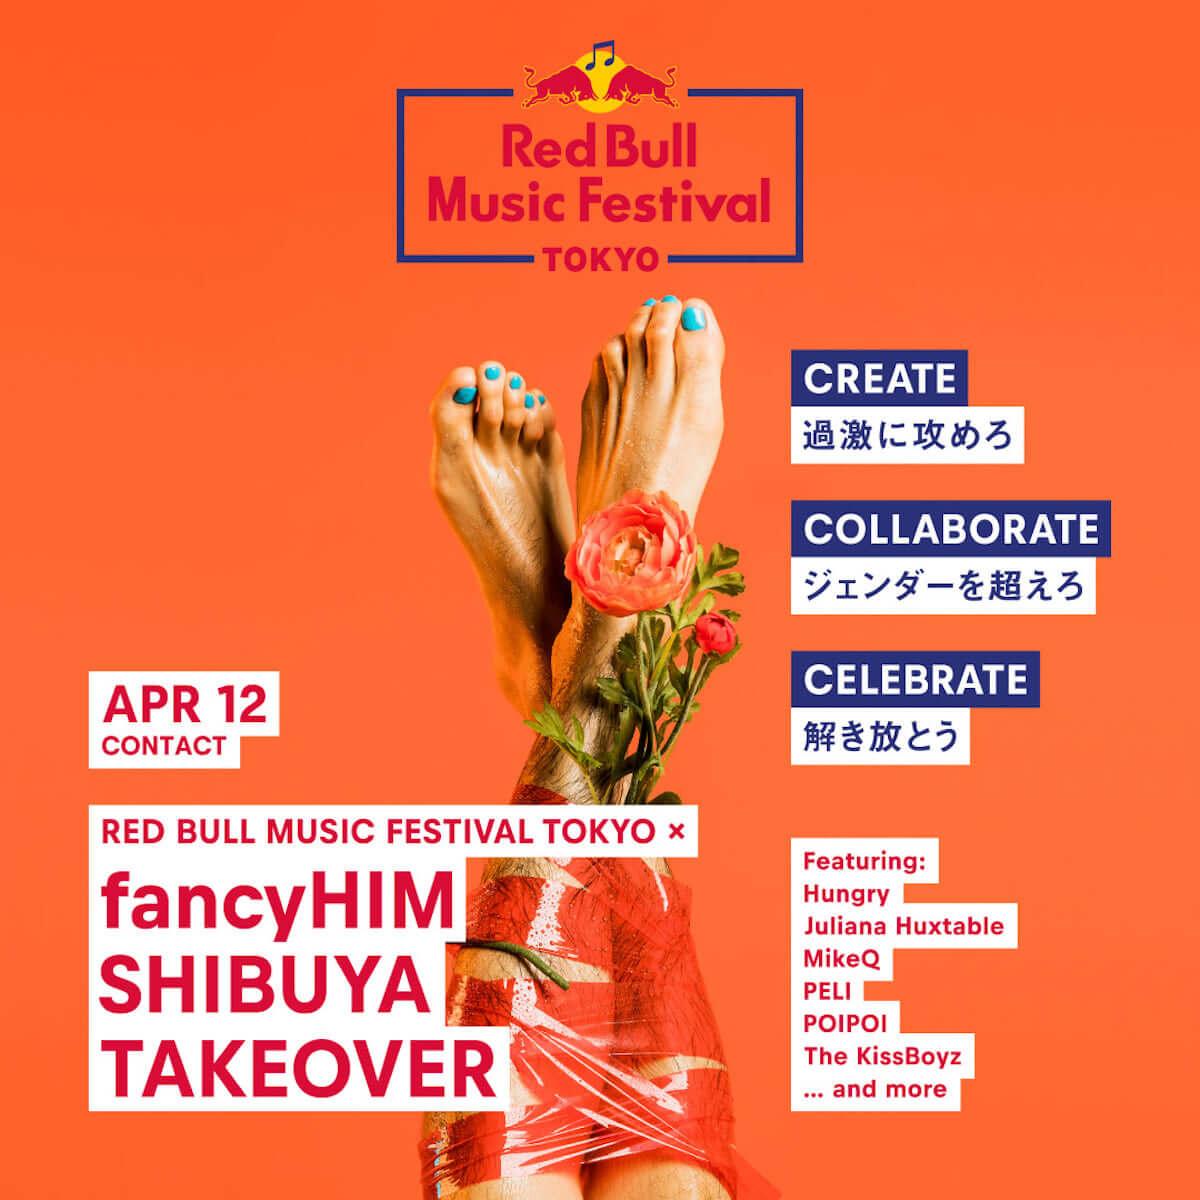 <Red Bull Music Festival Tokyo 2019>、東京で最もジェンダーレスなパーティ「fancyHIM」開催決定 music190401_fancyhim_1-1200x1200